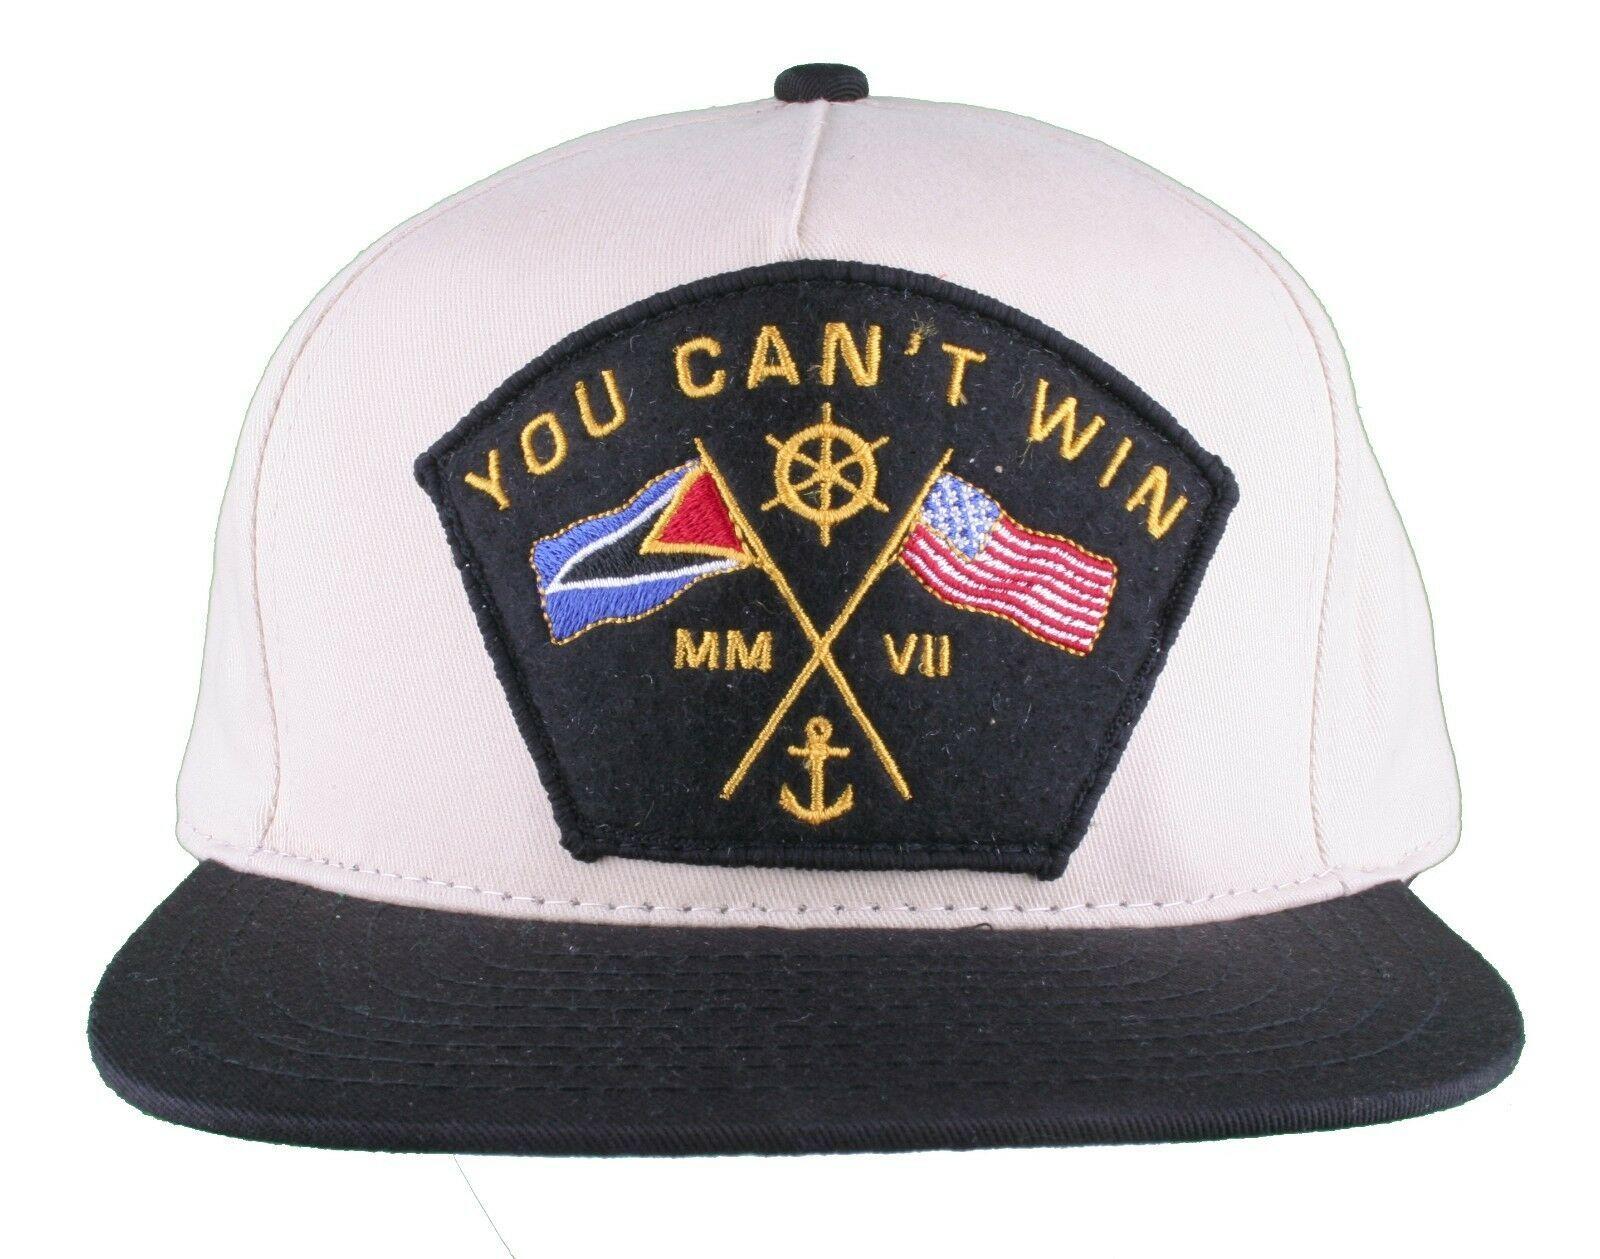 Motivation Du Cant Gewinnen Naval Creme Beige Khaki Snapback Baseballkappe Nwt